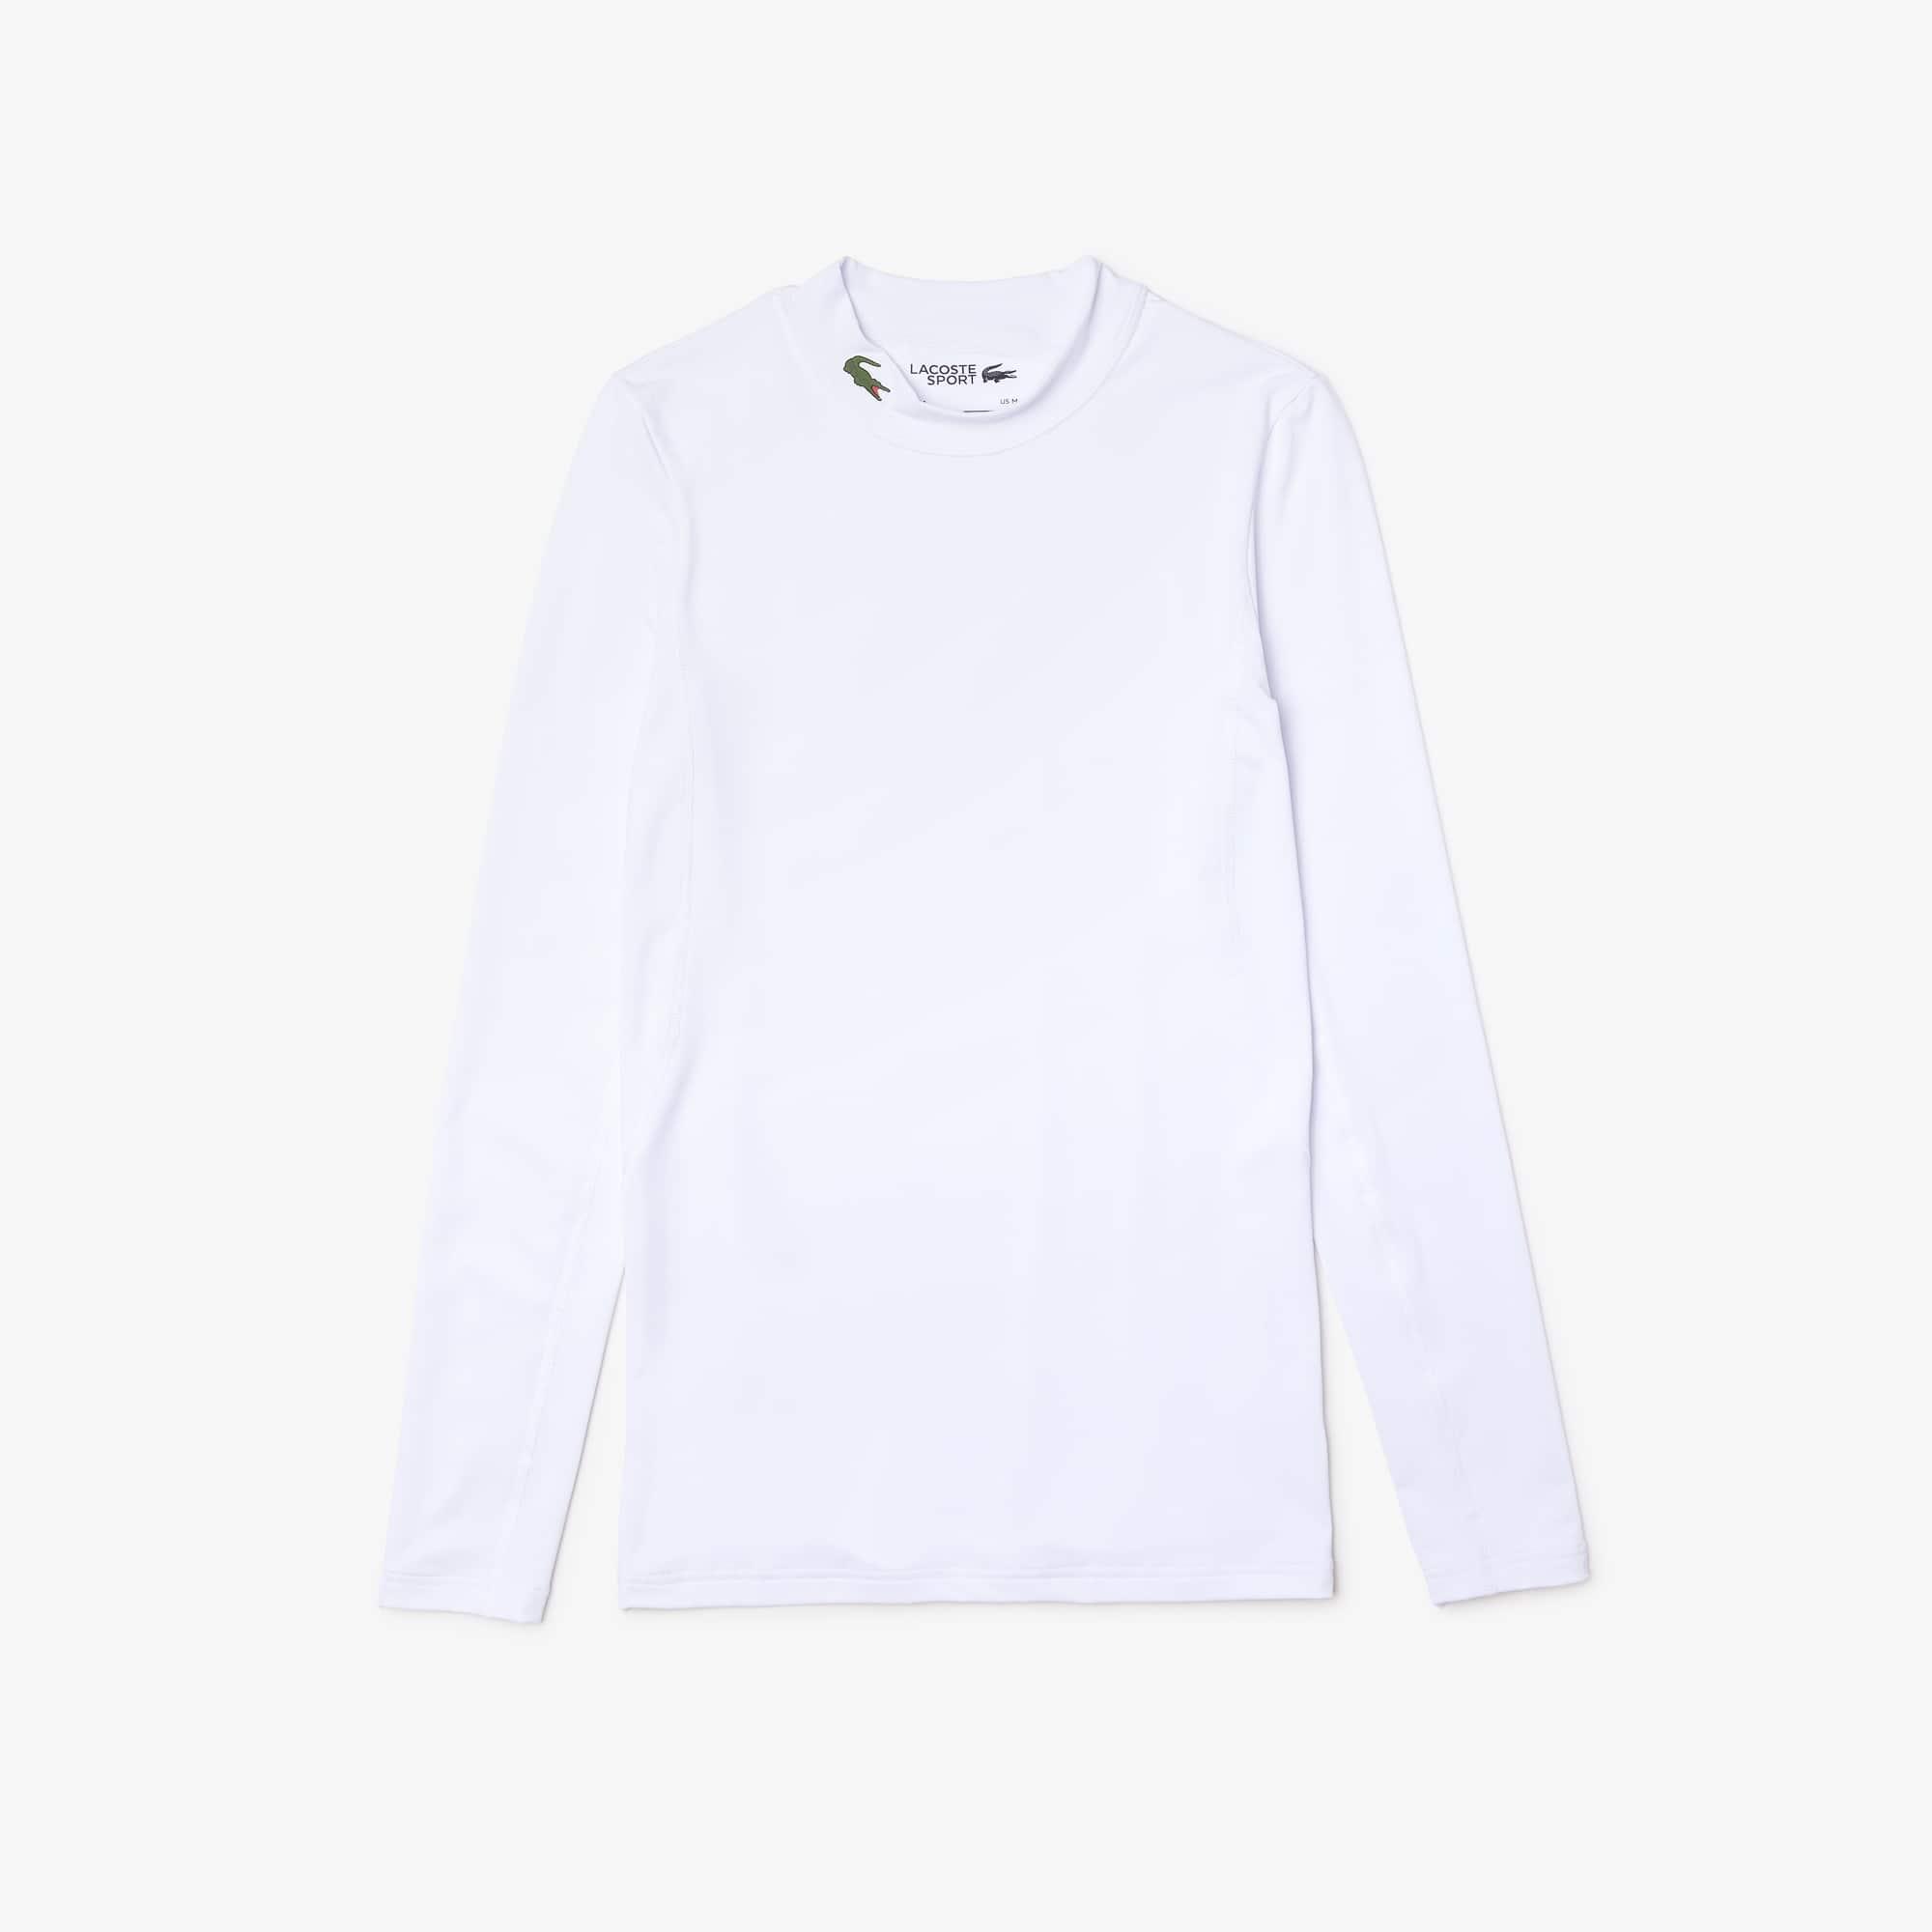 Herren LACOSTE SPORT Golf T-Shirt aus Funktionsjersey